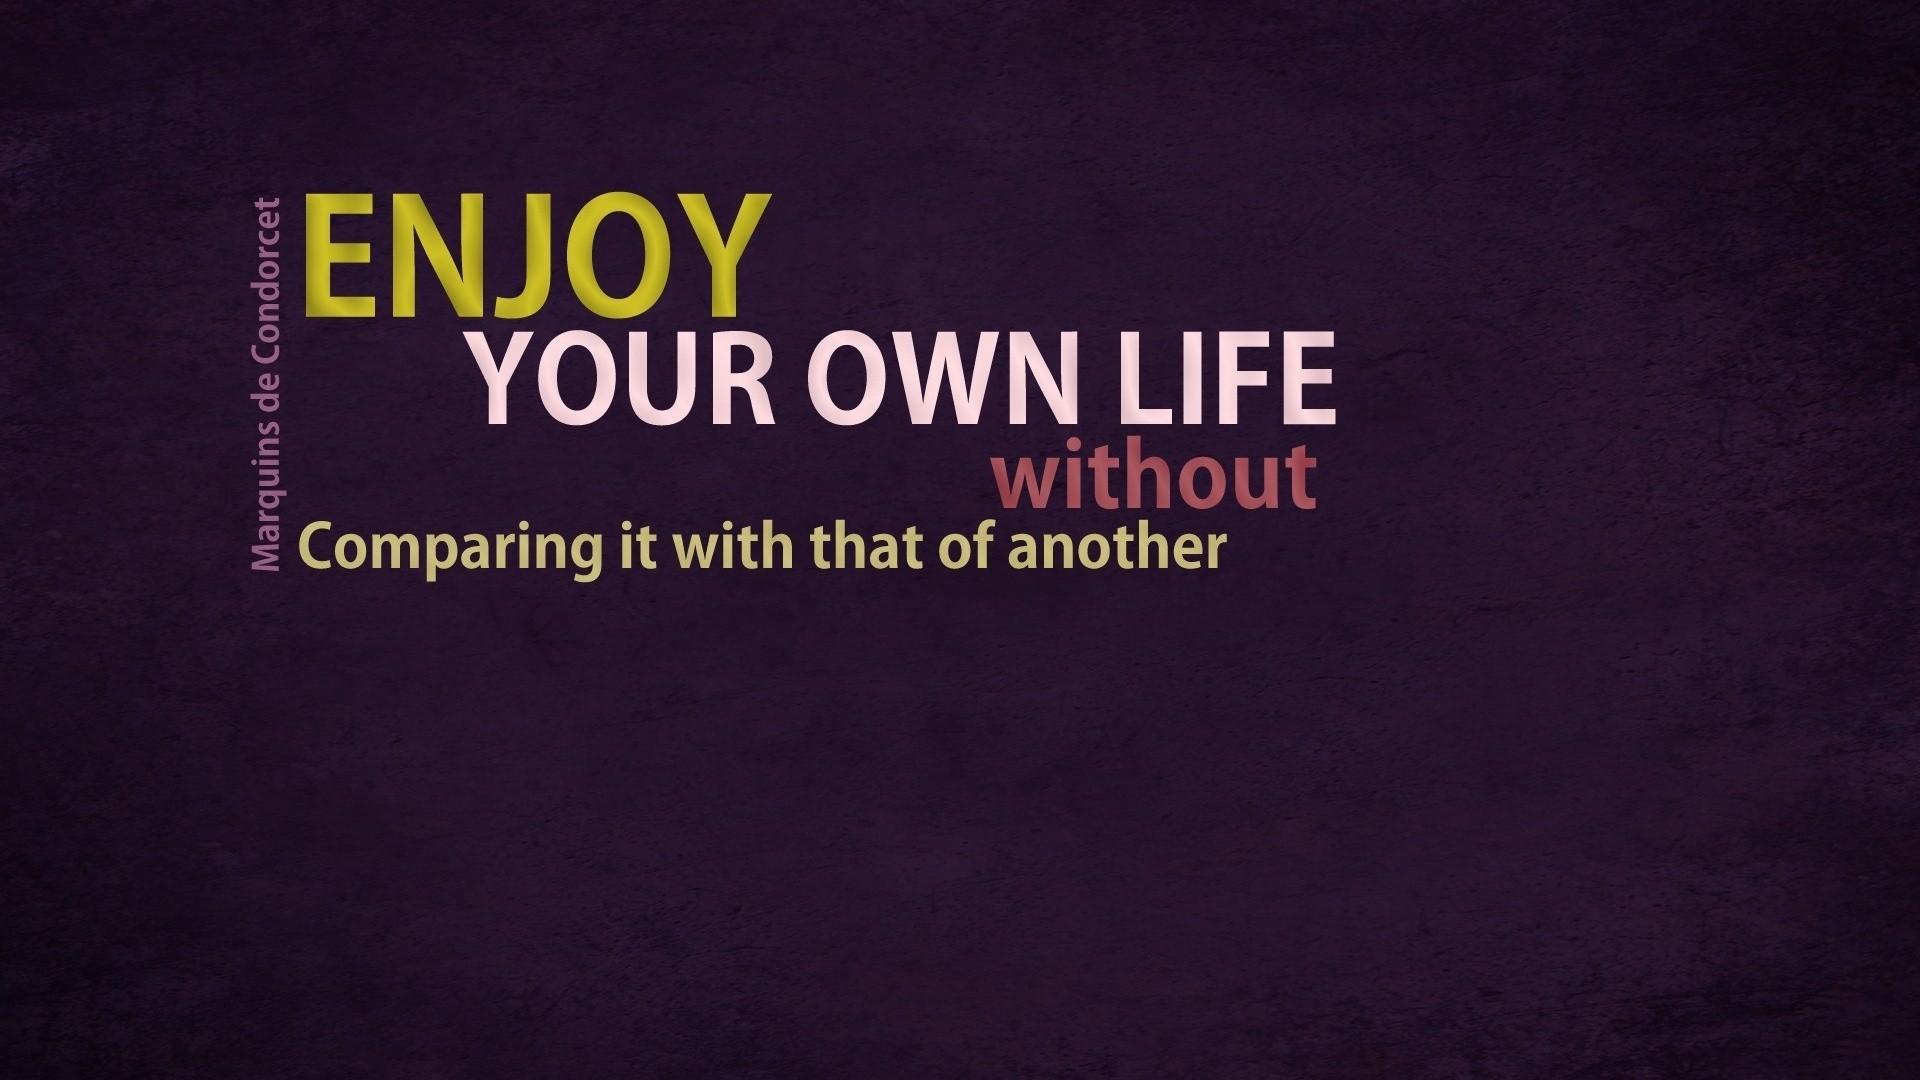 motivational_inspirational_quotes_wallpaper_11.jpg